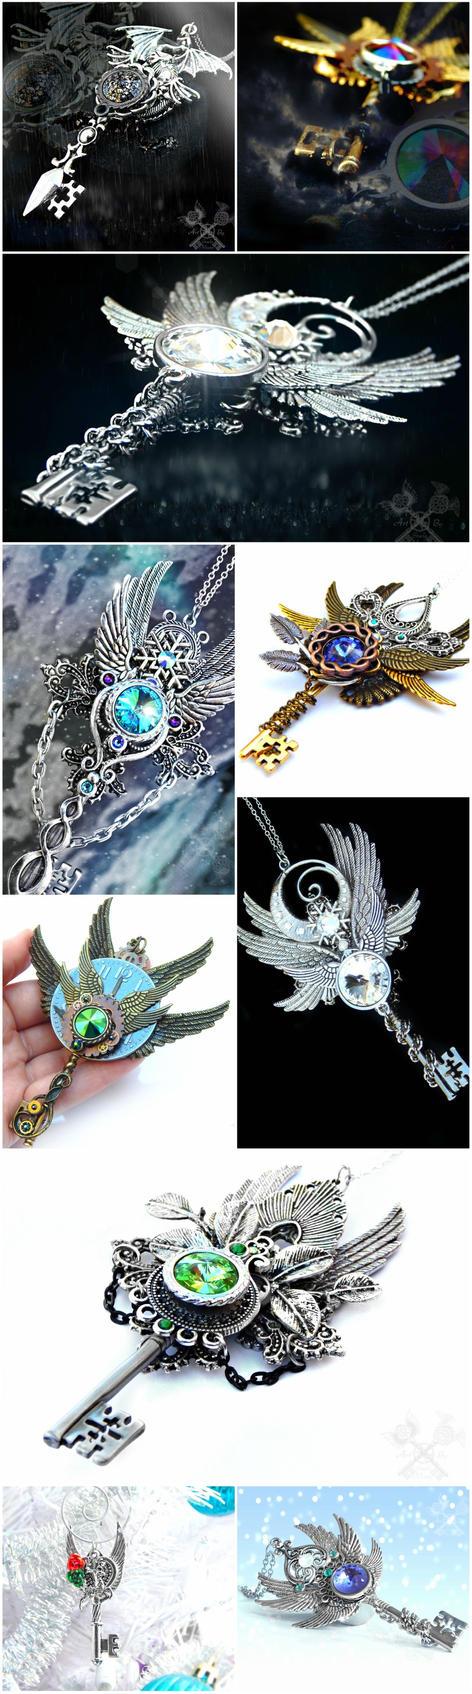 Skeleton Key Necklaces Galore! by ArtByStarlaMoore